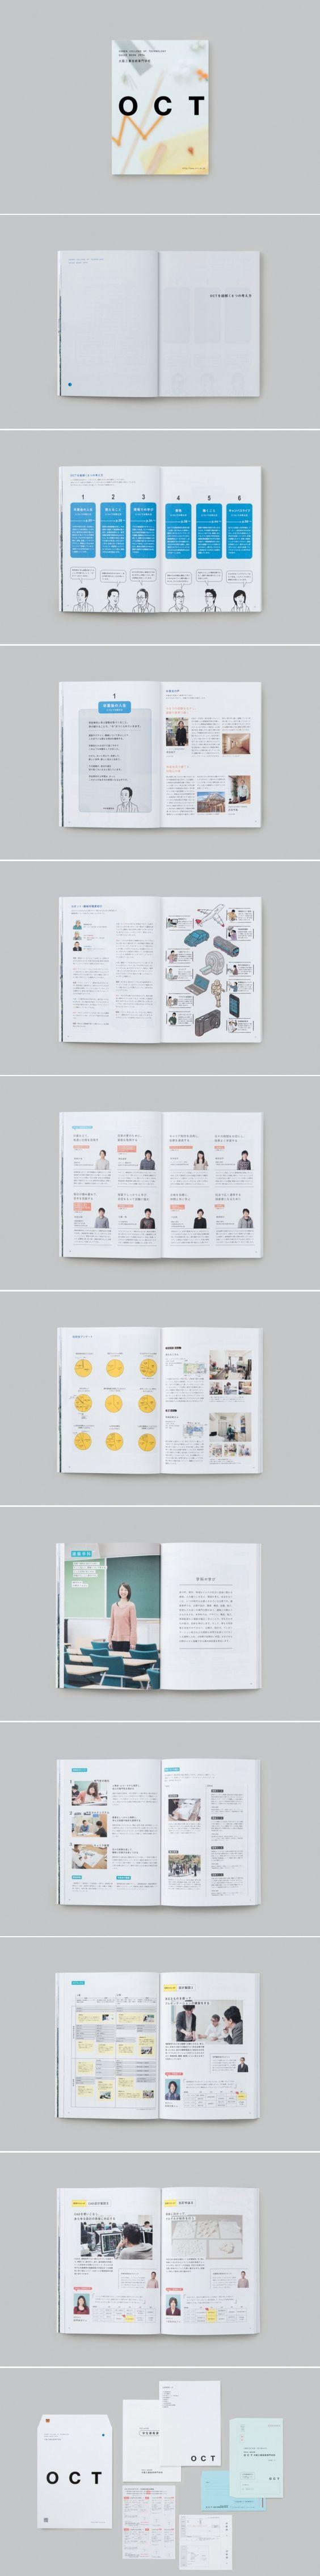 OSAKA COLLEGE OF TECHNOLOGY GUIDE BOOK 2014 : UMA / design farm